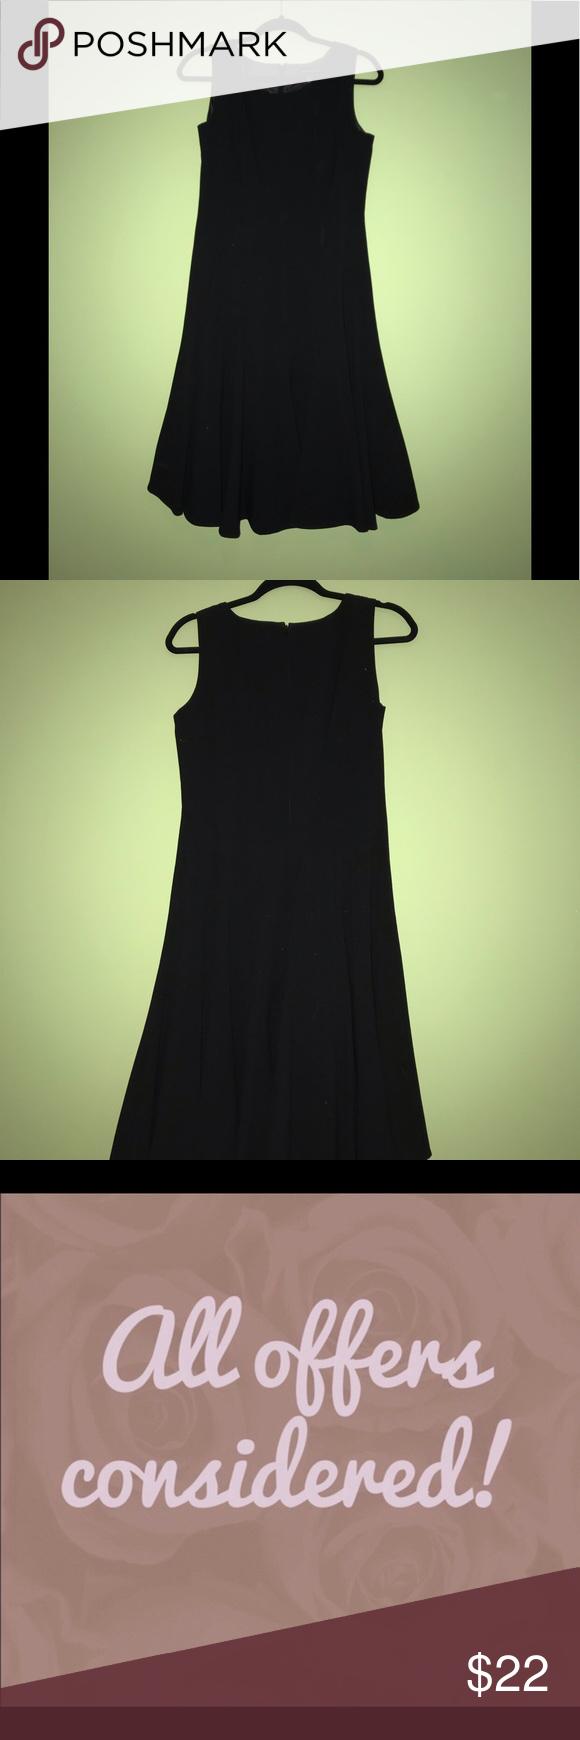 ❤️3 for $28❤️ Dana Buchman Black Dress 0918 Excellent condition, size 4, beautiful design. I consider all offers. Dana Buchman Dresses Asymmetrical